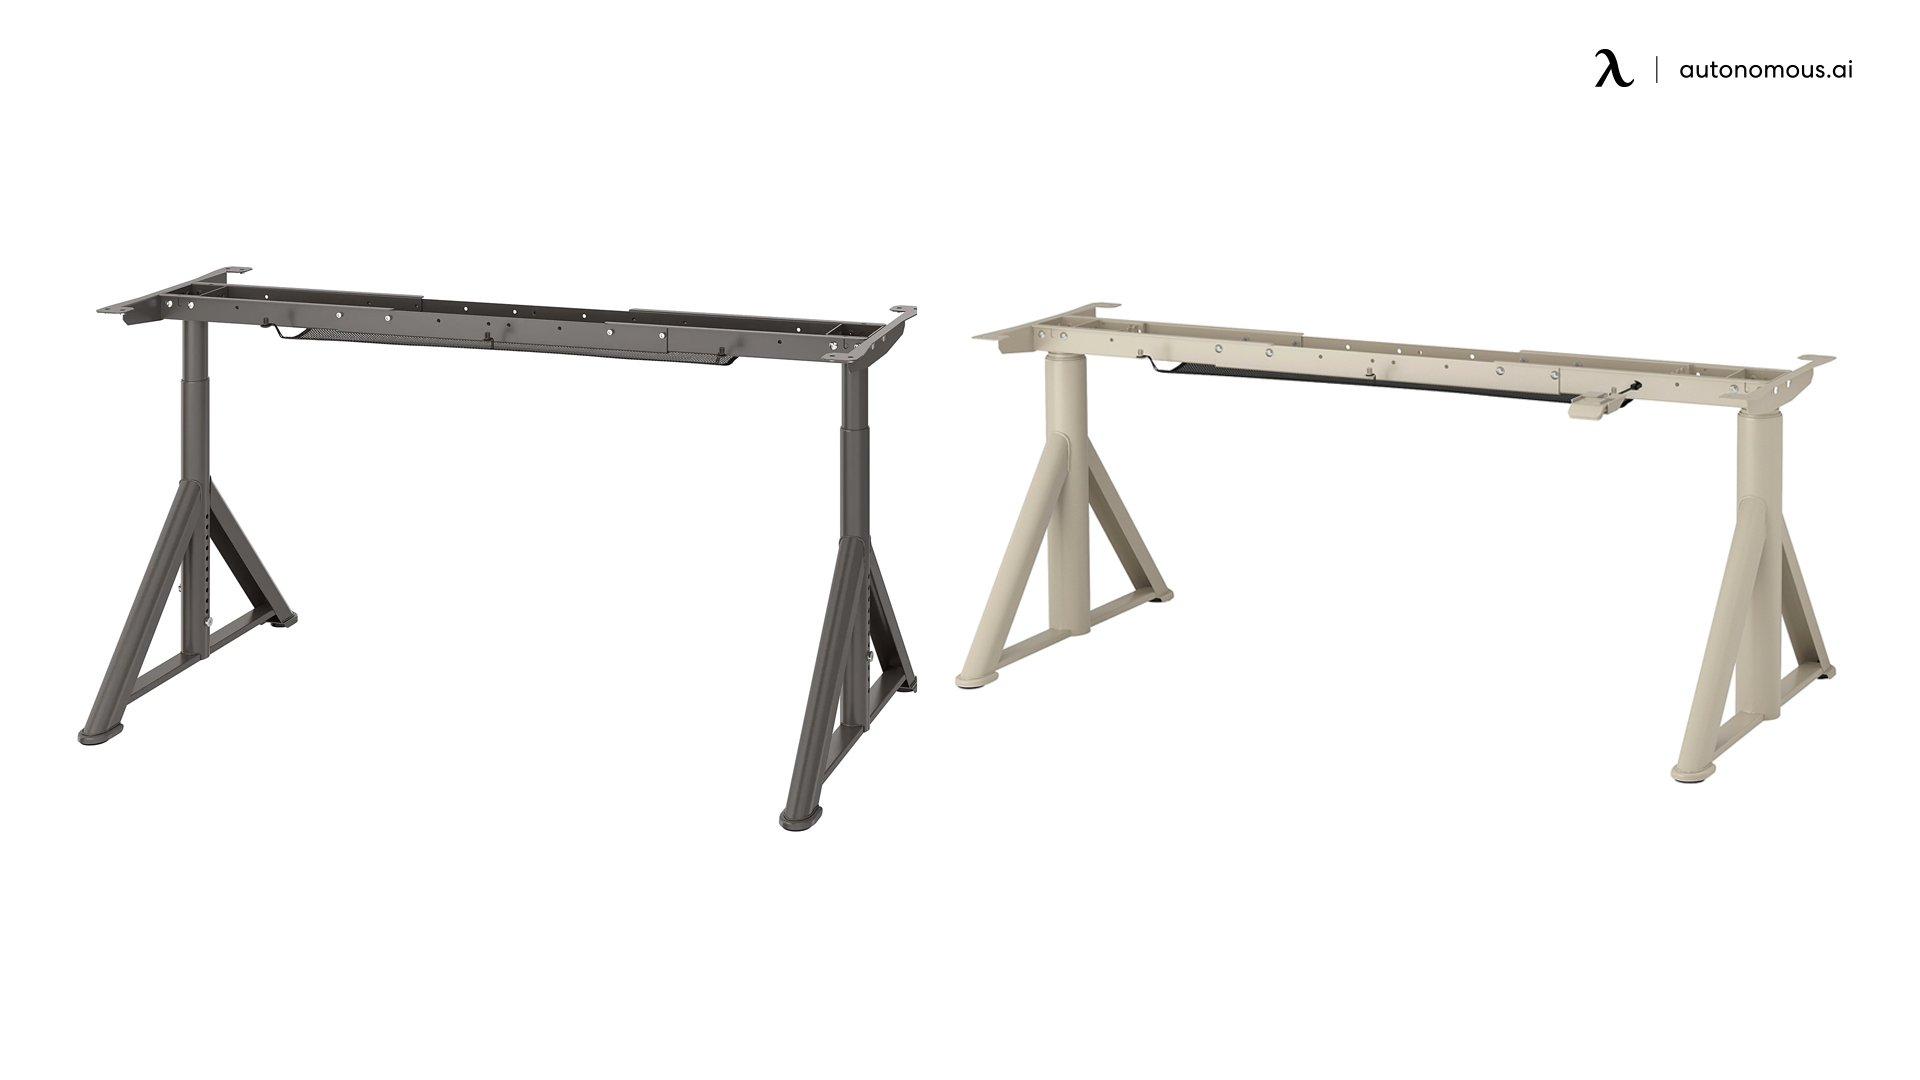 Ikea underframe